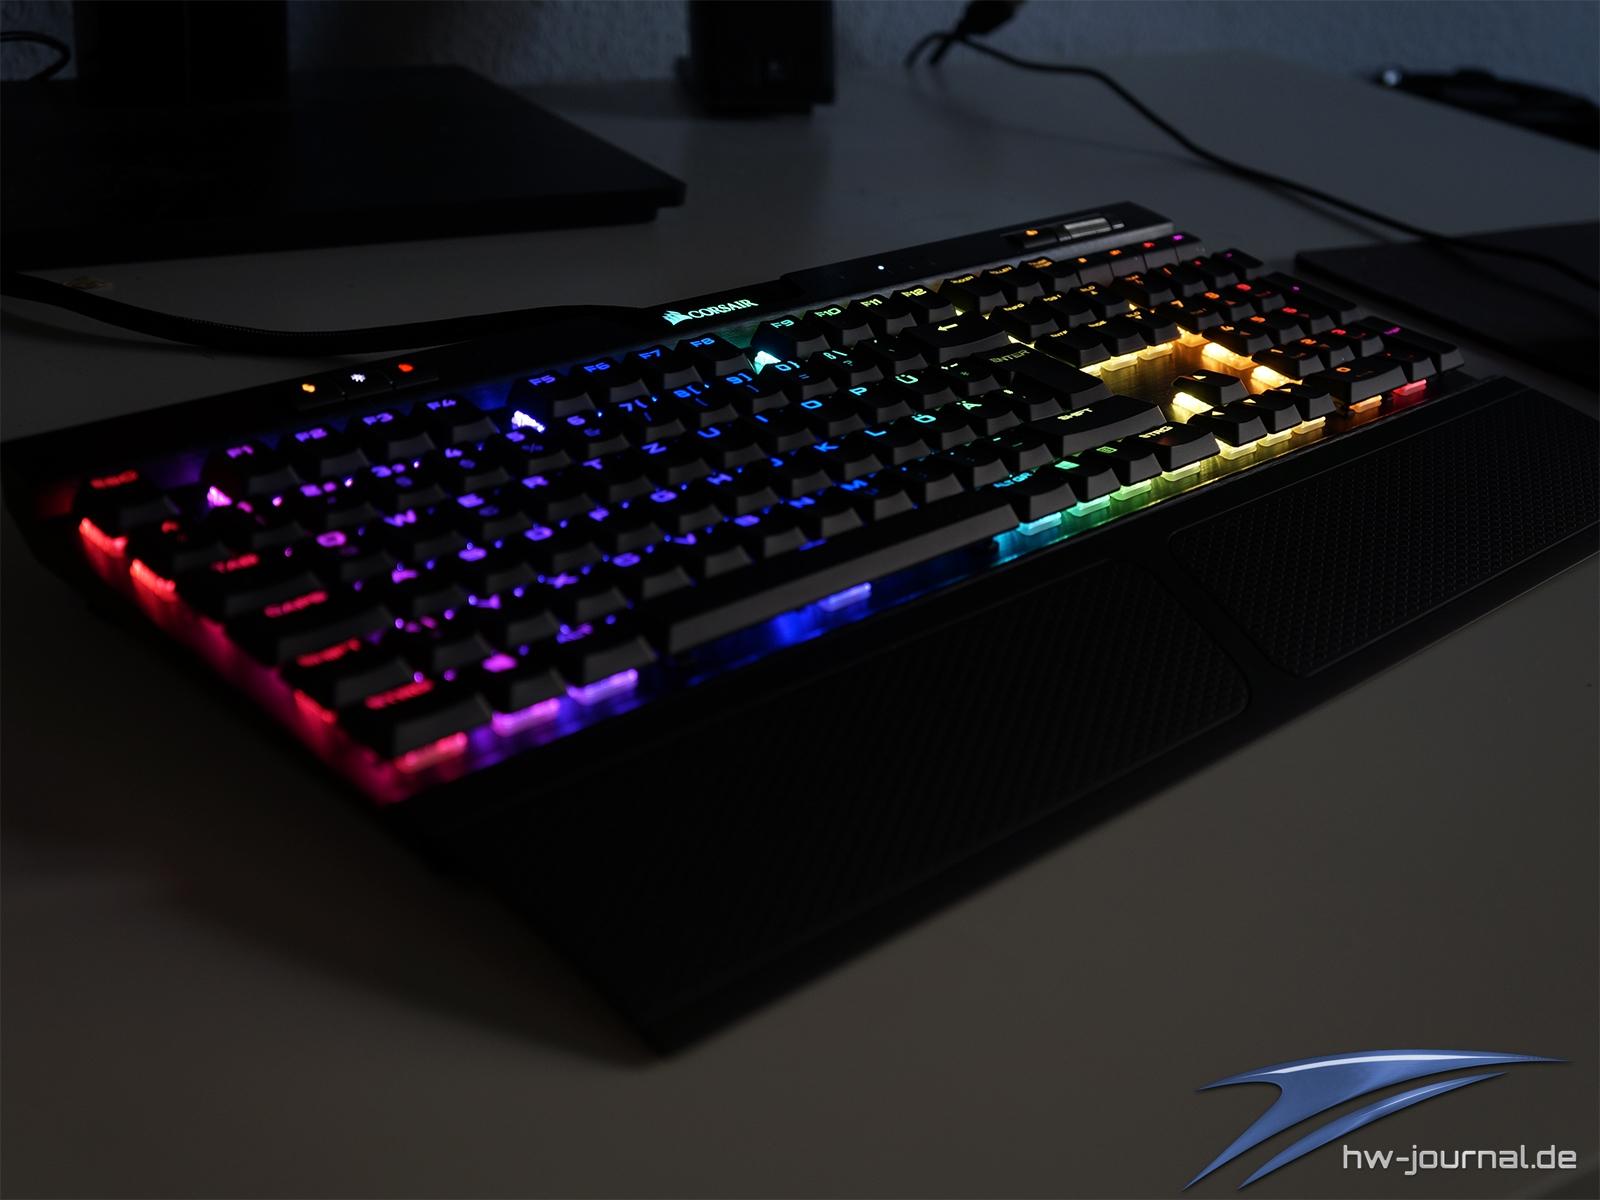 Test: Corsair K70 RGB MK 2 Low Profile Rapidfire - Hardware